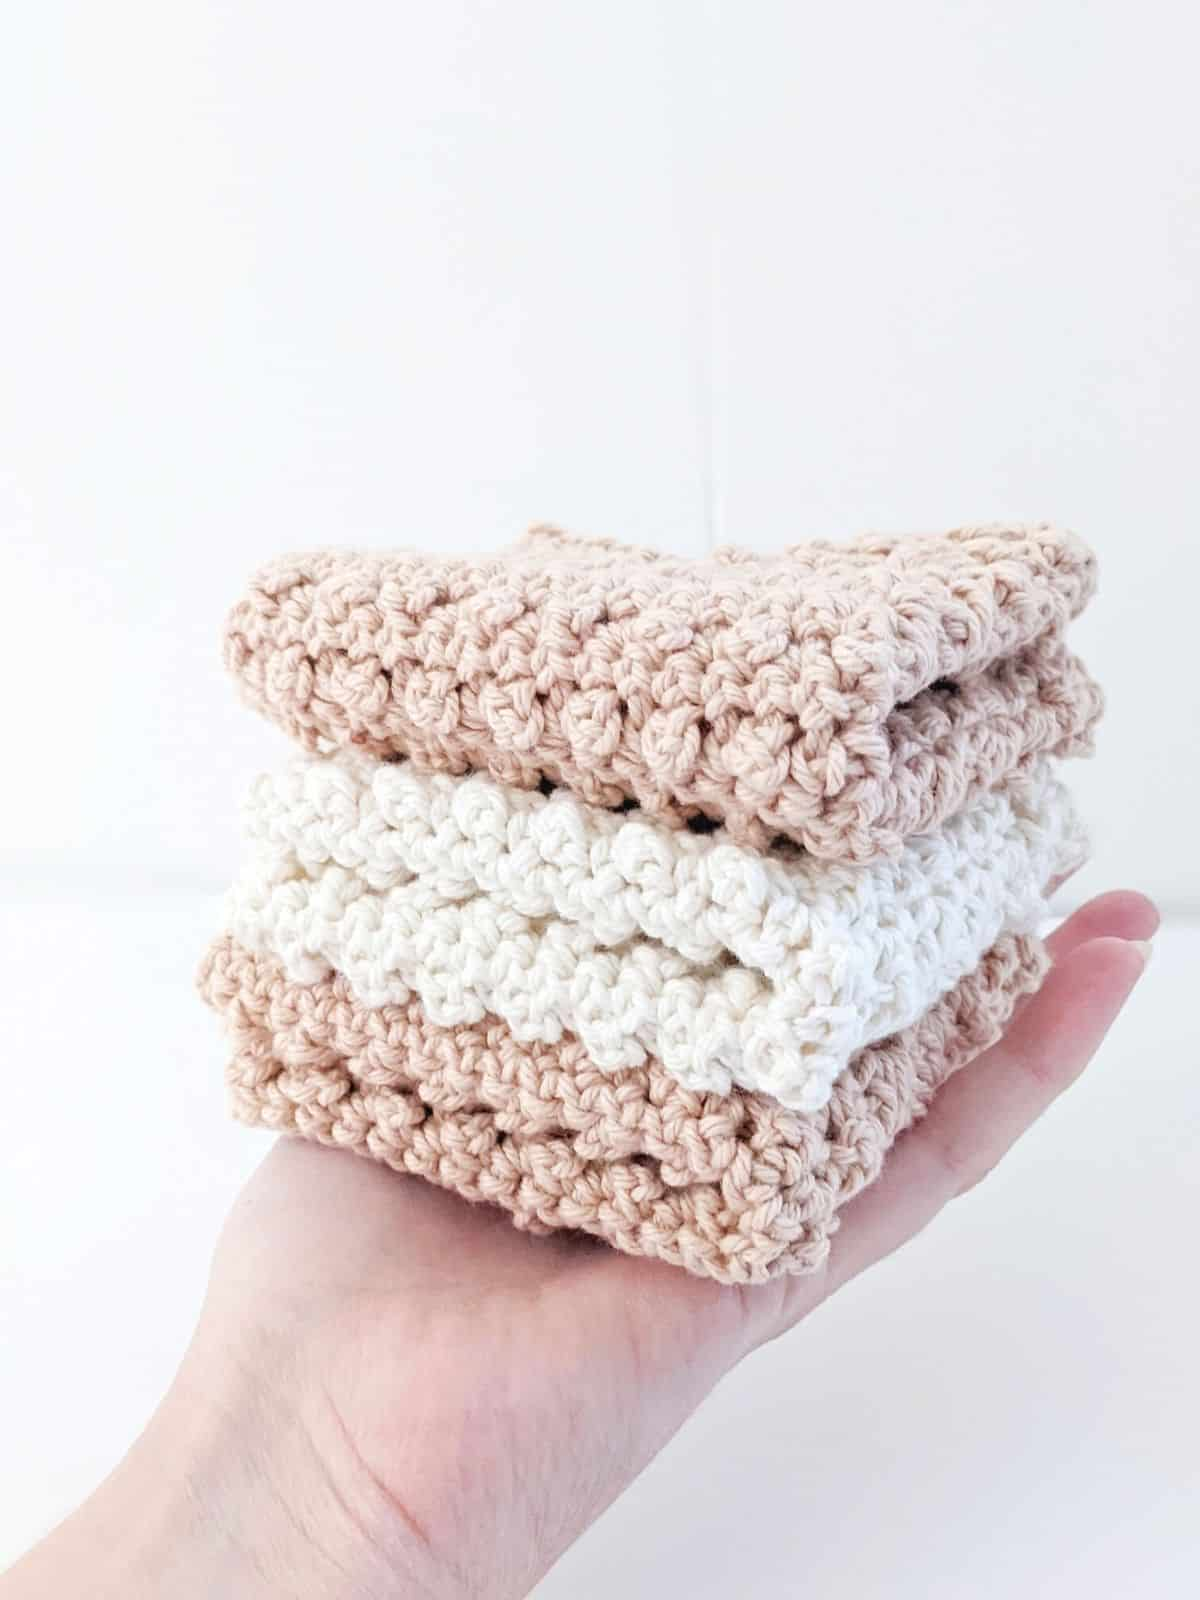 model holding 3 folded crochet dishcloths in the color white and linen